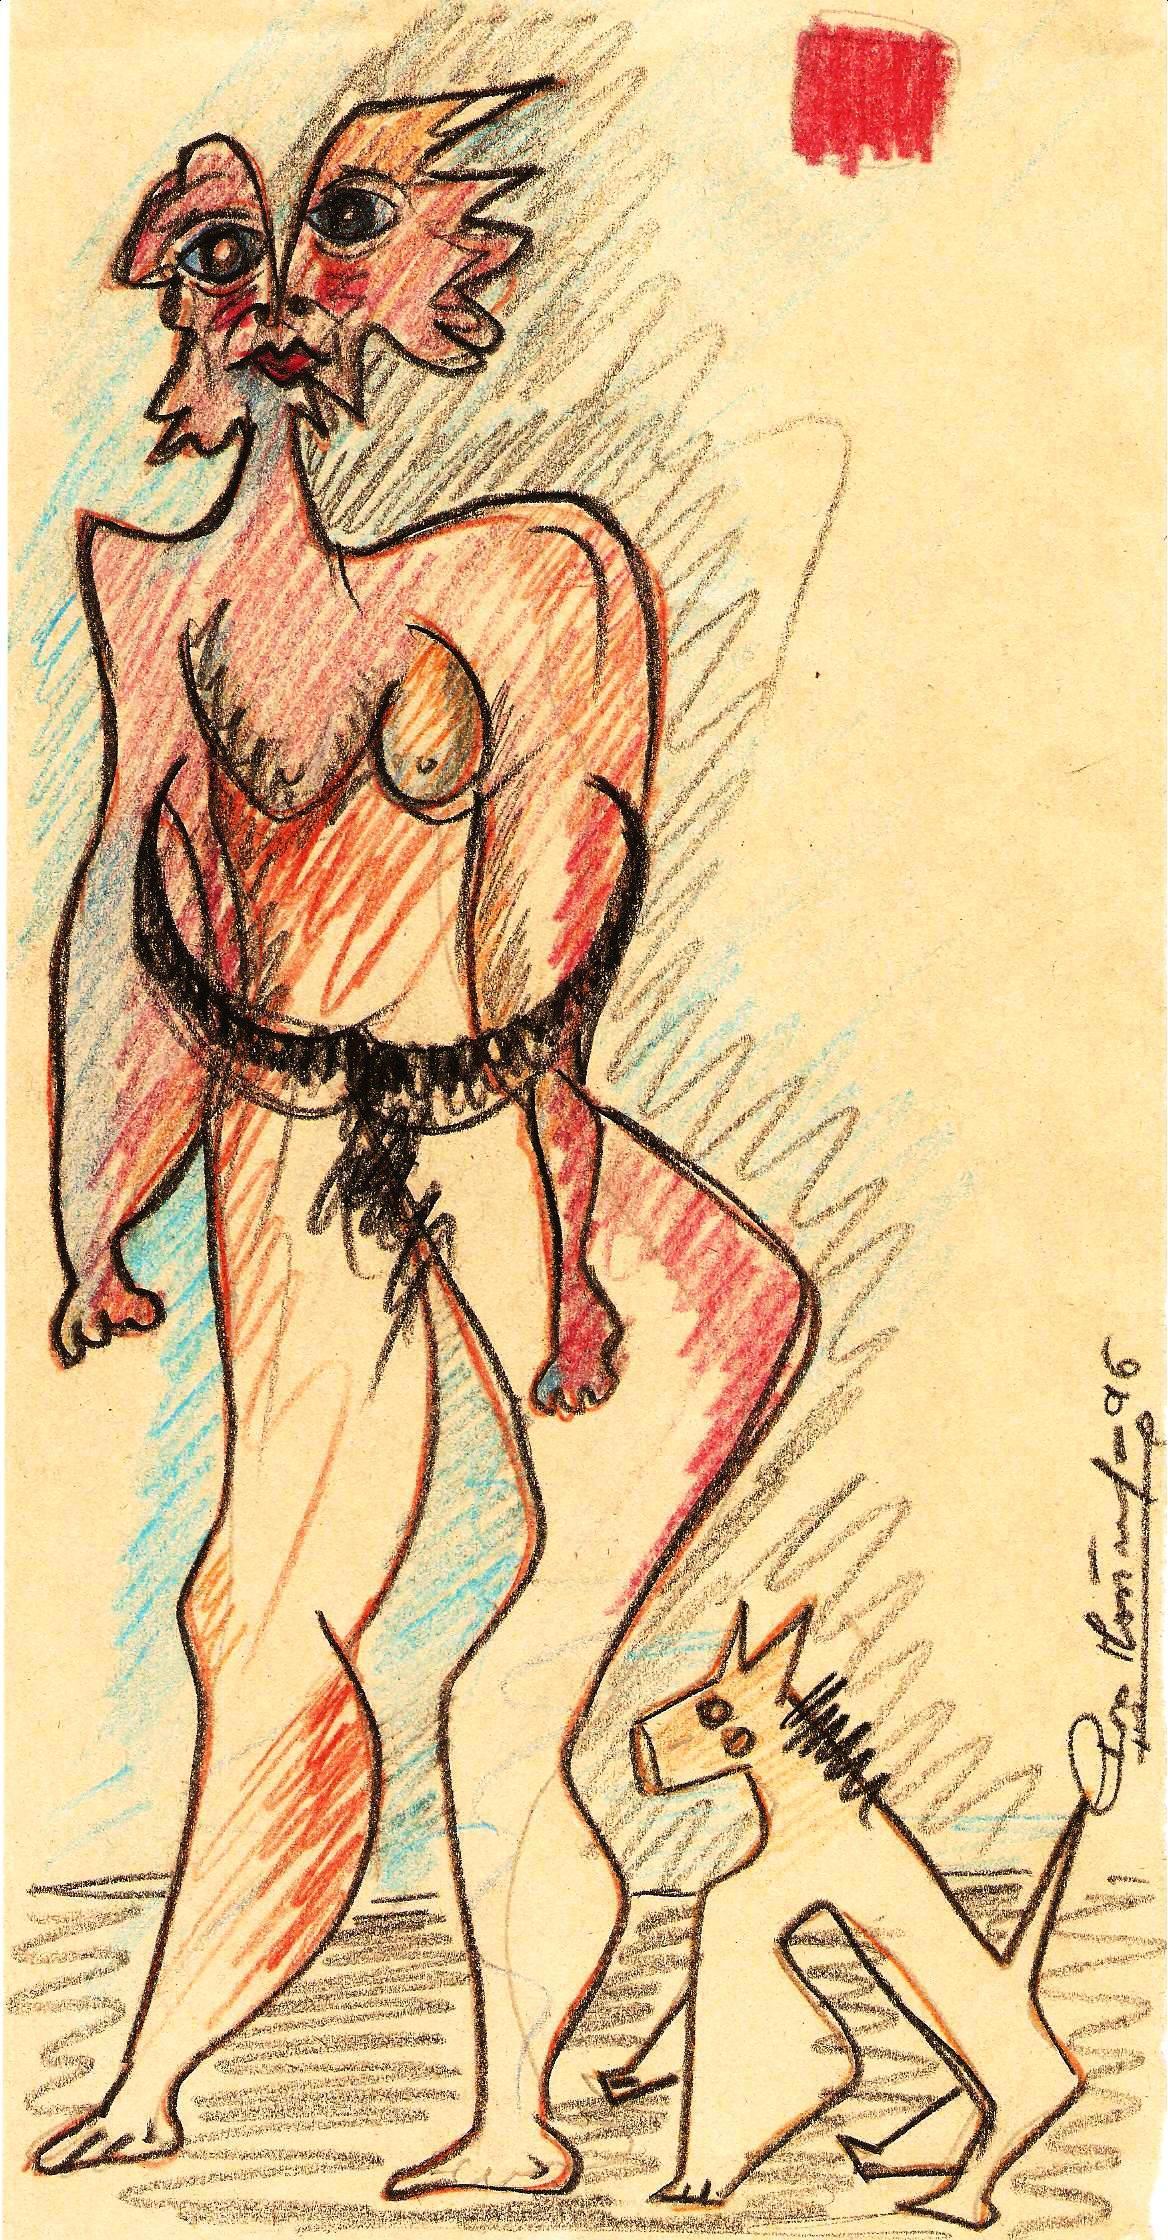 Disegno,1996 pastello su carta, Pio Mastrogiacomo Acerno (SA)